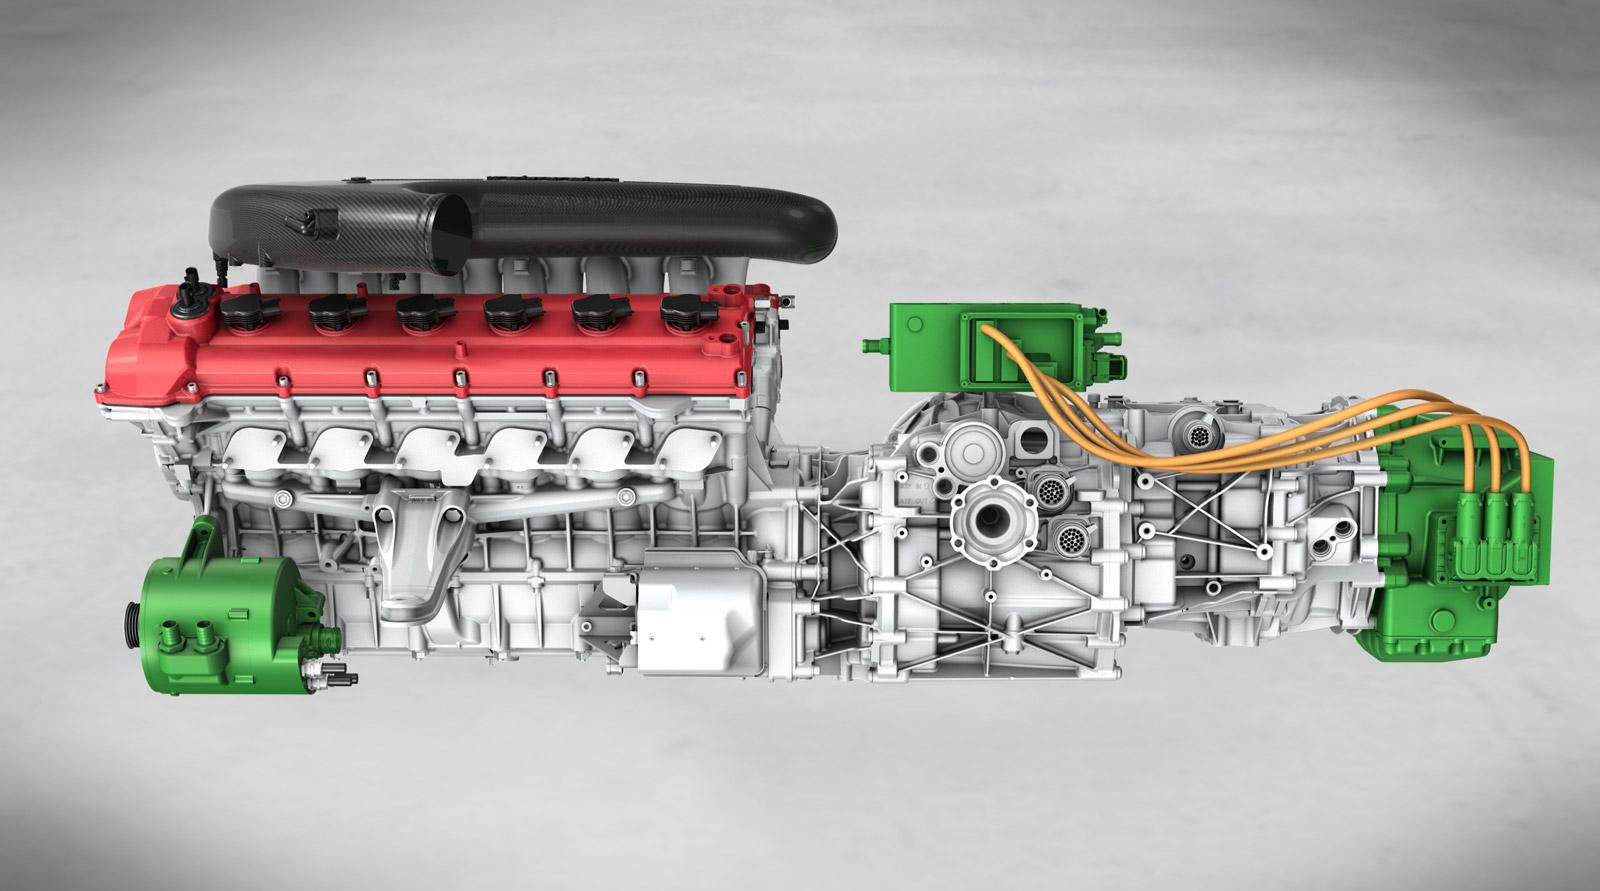 mid engine car diagram ferrari reveals latest hy-kers v-12 hybrid drivetrain